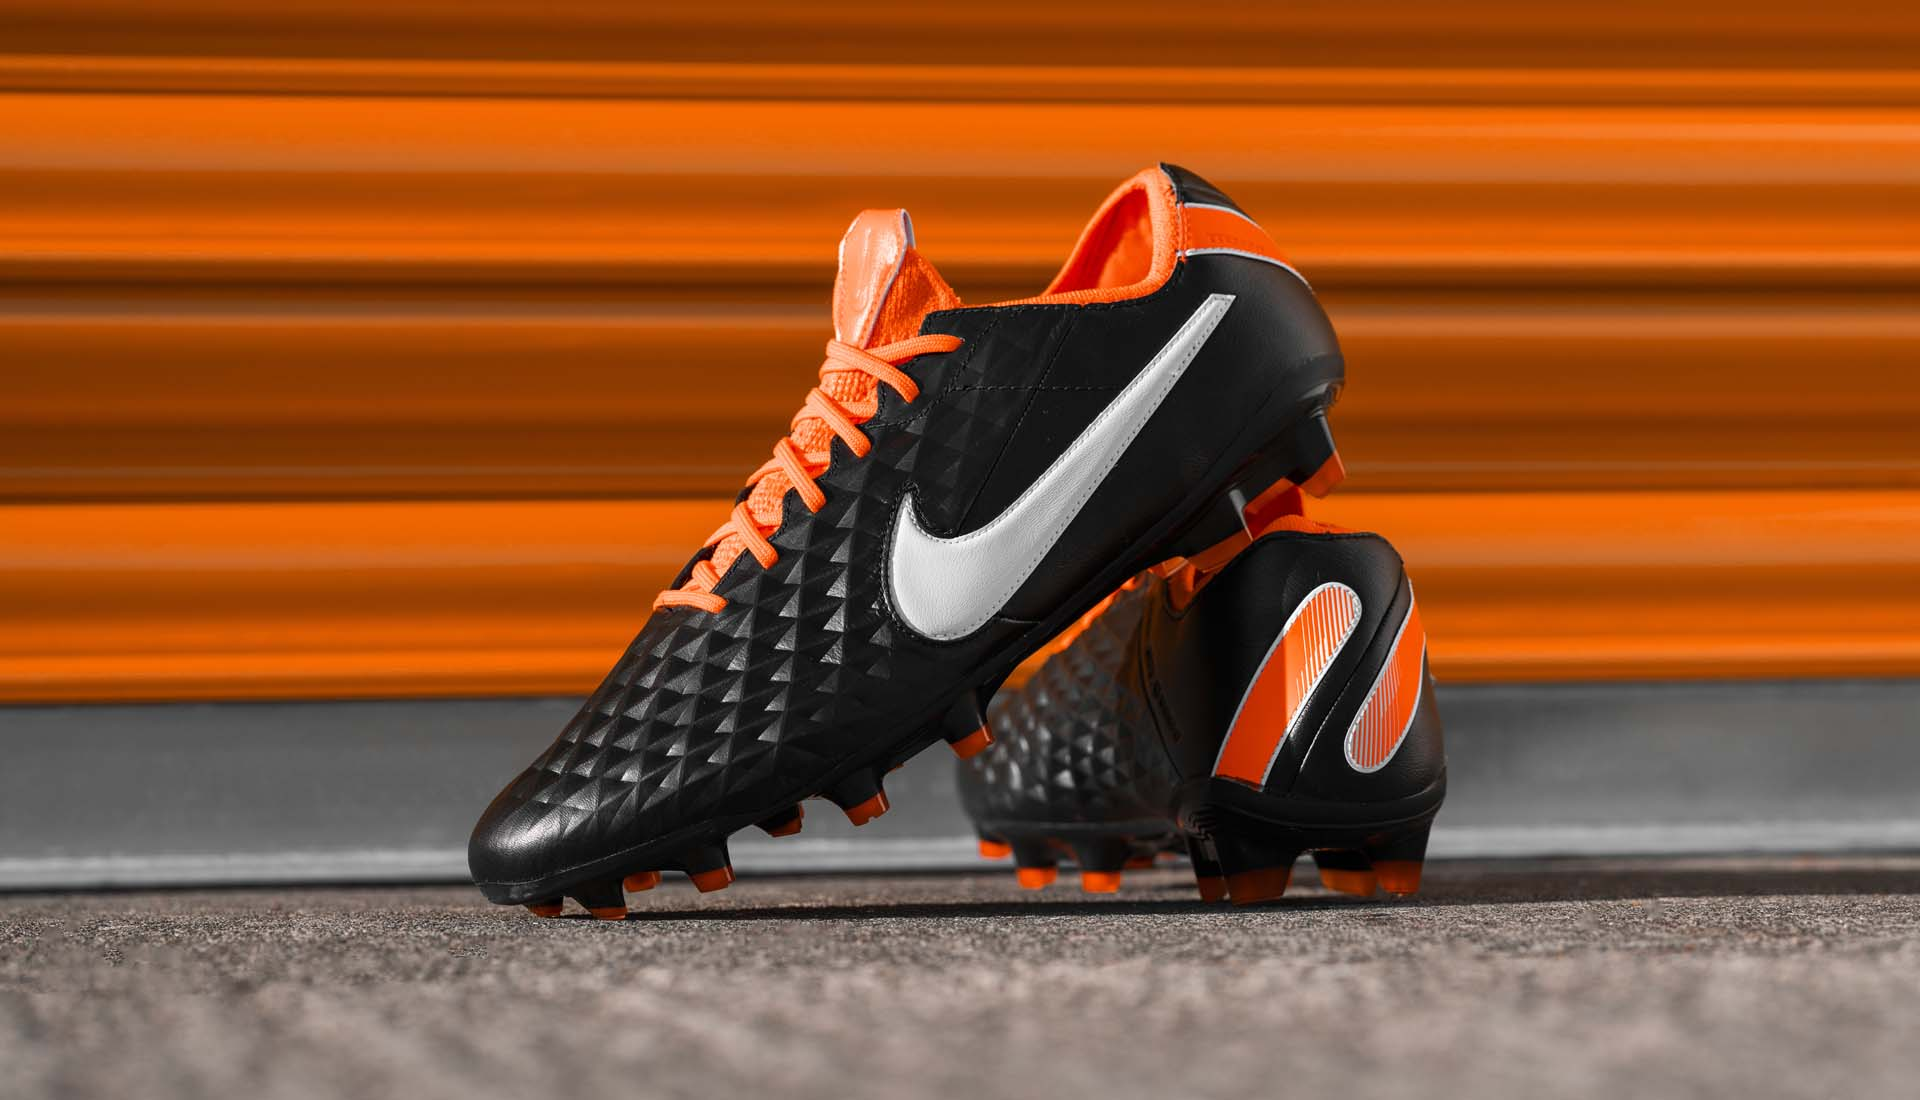 episodio Línea de metal caliente  Nike Launch The 'Future DNA' Tiempo Legend Football Boots - SoccerBible